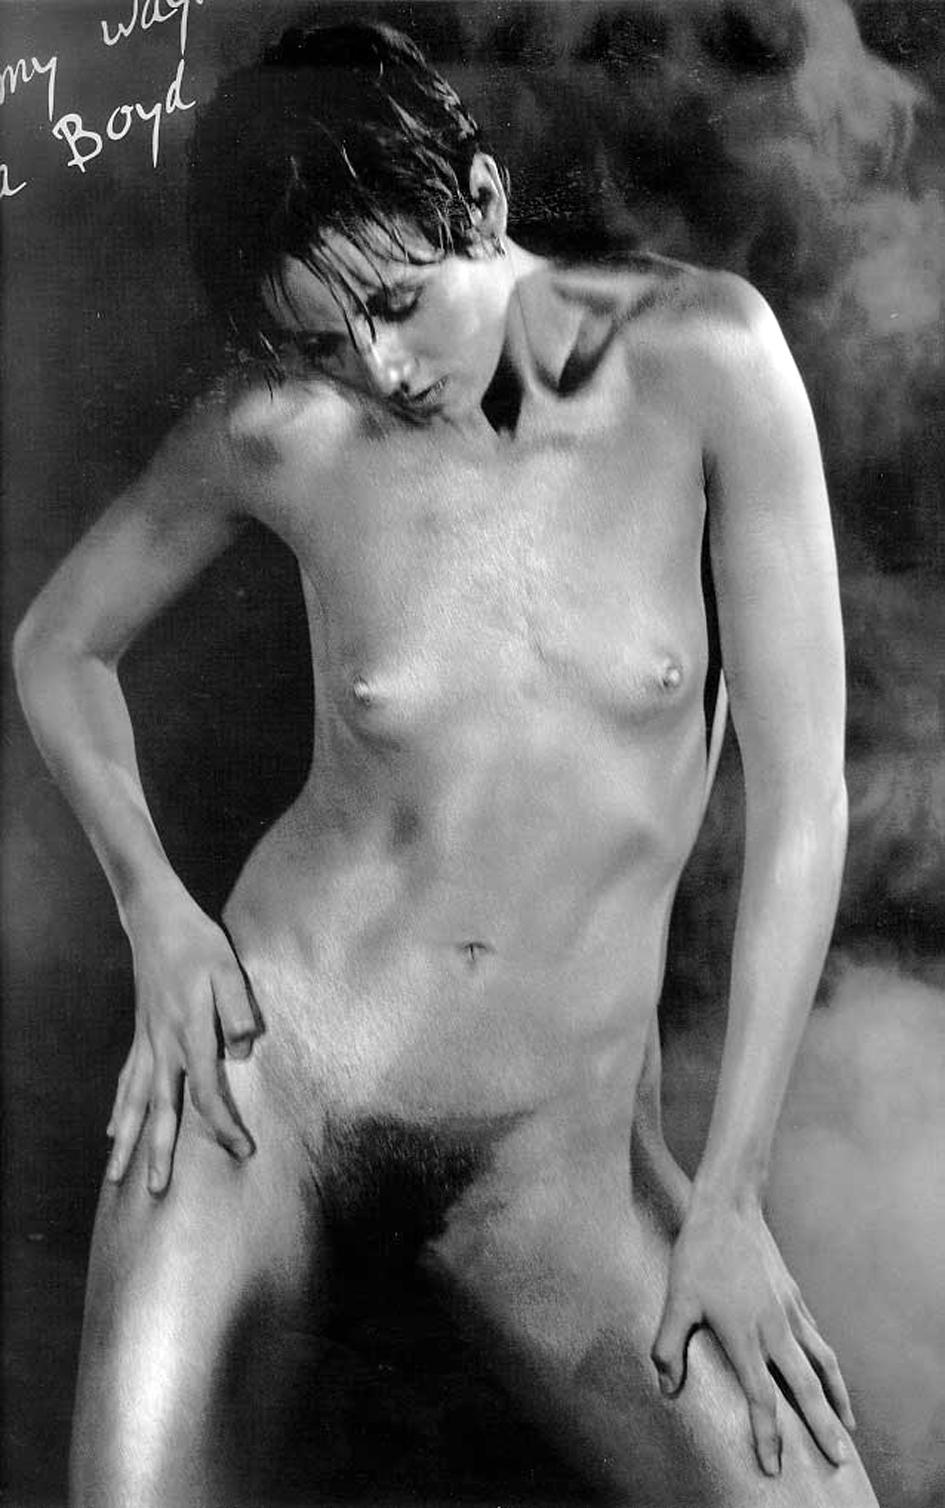 Cosplay erotica wonder woman